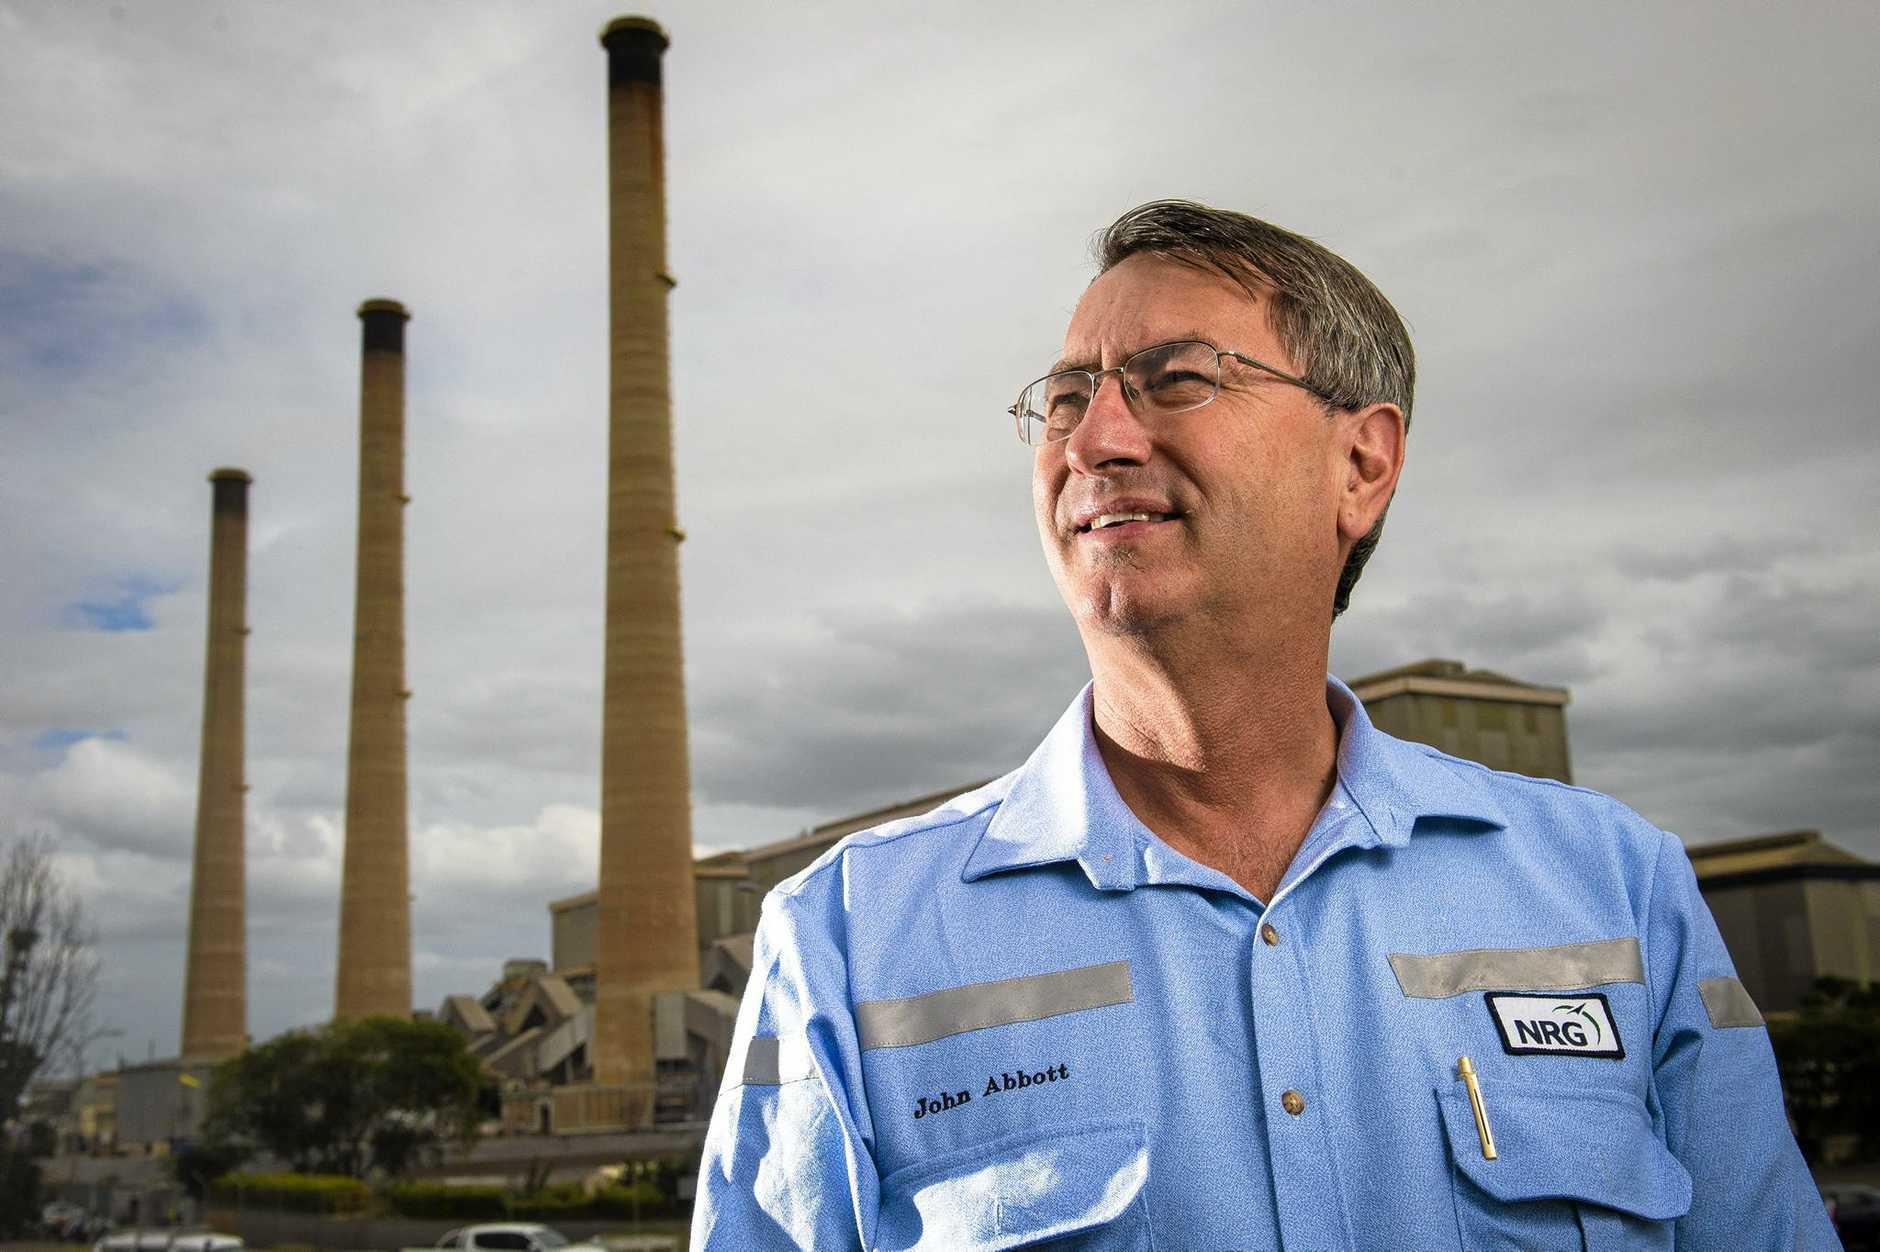 NRG GM John Abbott has resigned effective immediately.Photo Luka Kauzlaric / The Observer